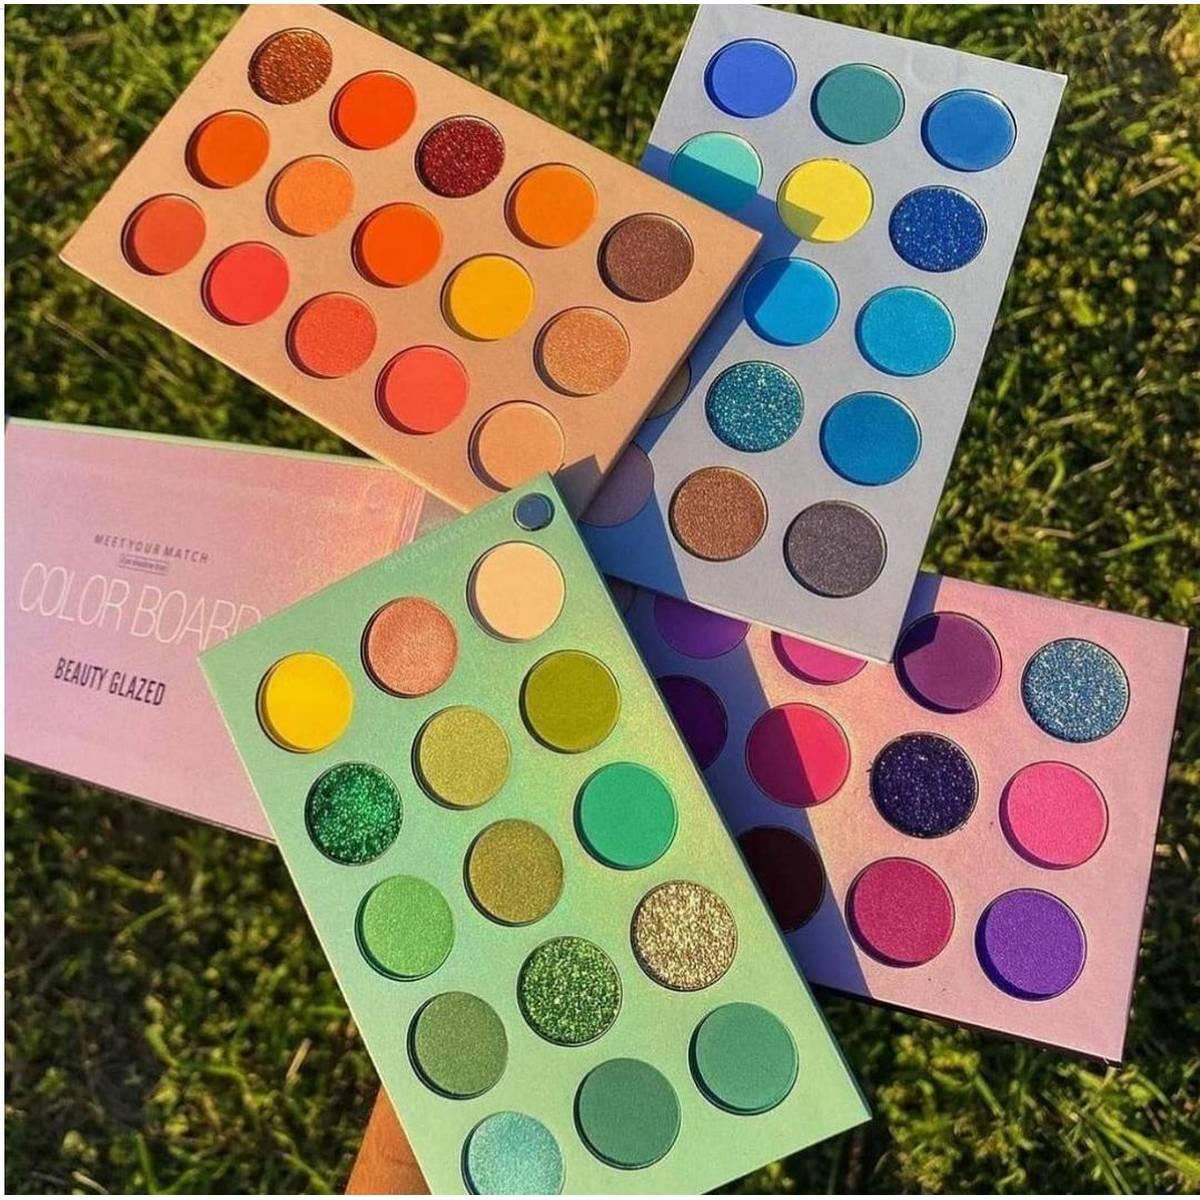 Beauty Glazed 60 Colors Pearlescent Matte Eyeshadow, Eye Cosmetics, Makeup Palette, 4Folding Palette